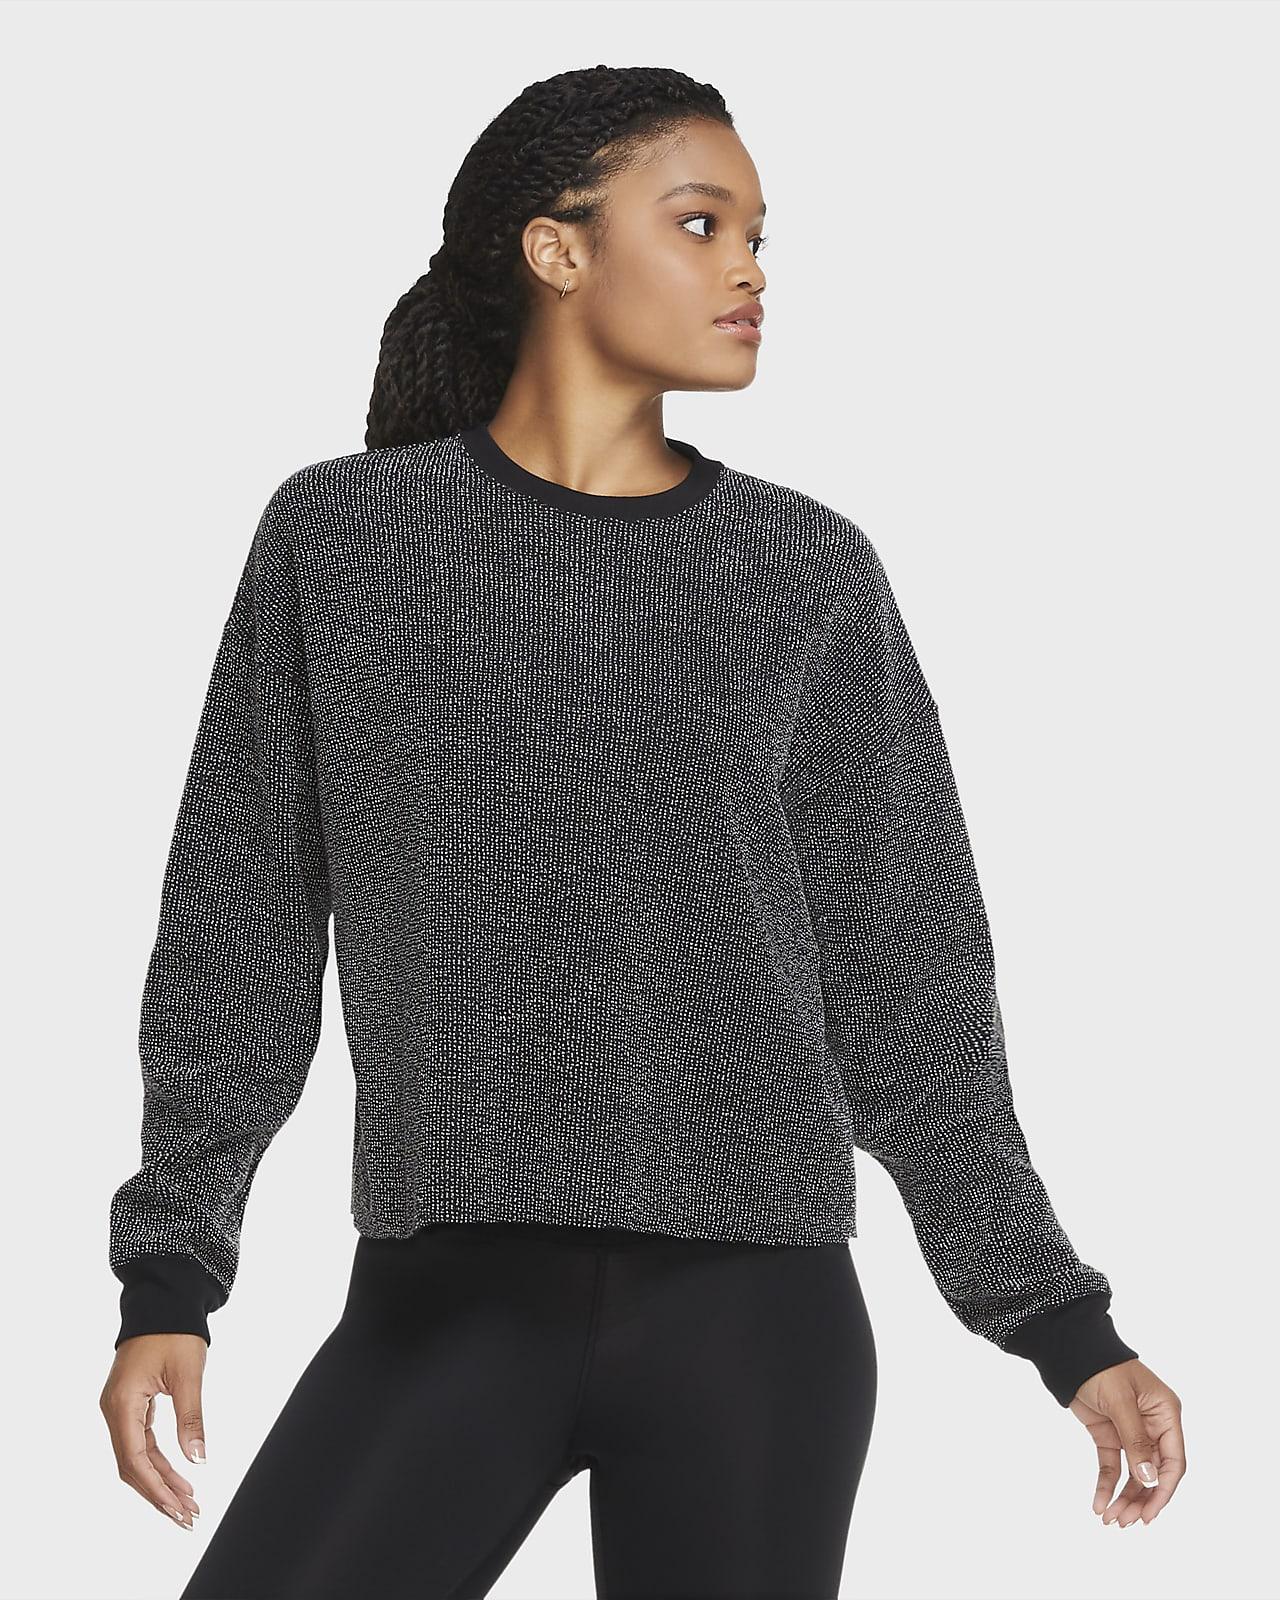 Camisola Nike Yoga para mulher